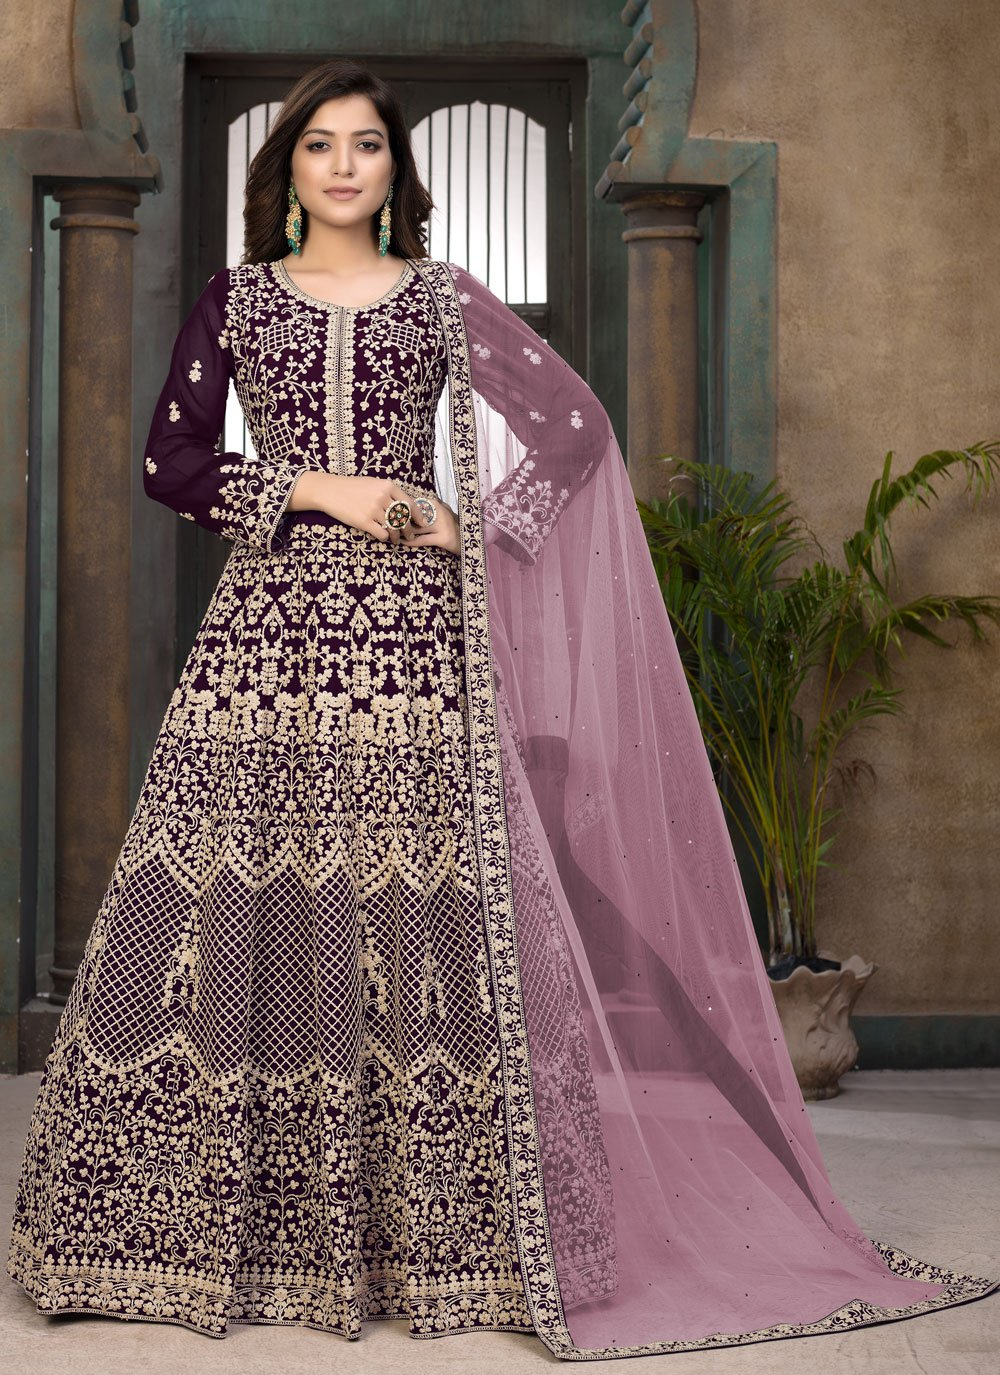 Faux Georgette Resham Floor Length Anarkali Suit in Wine